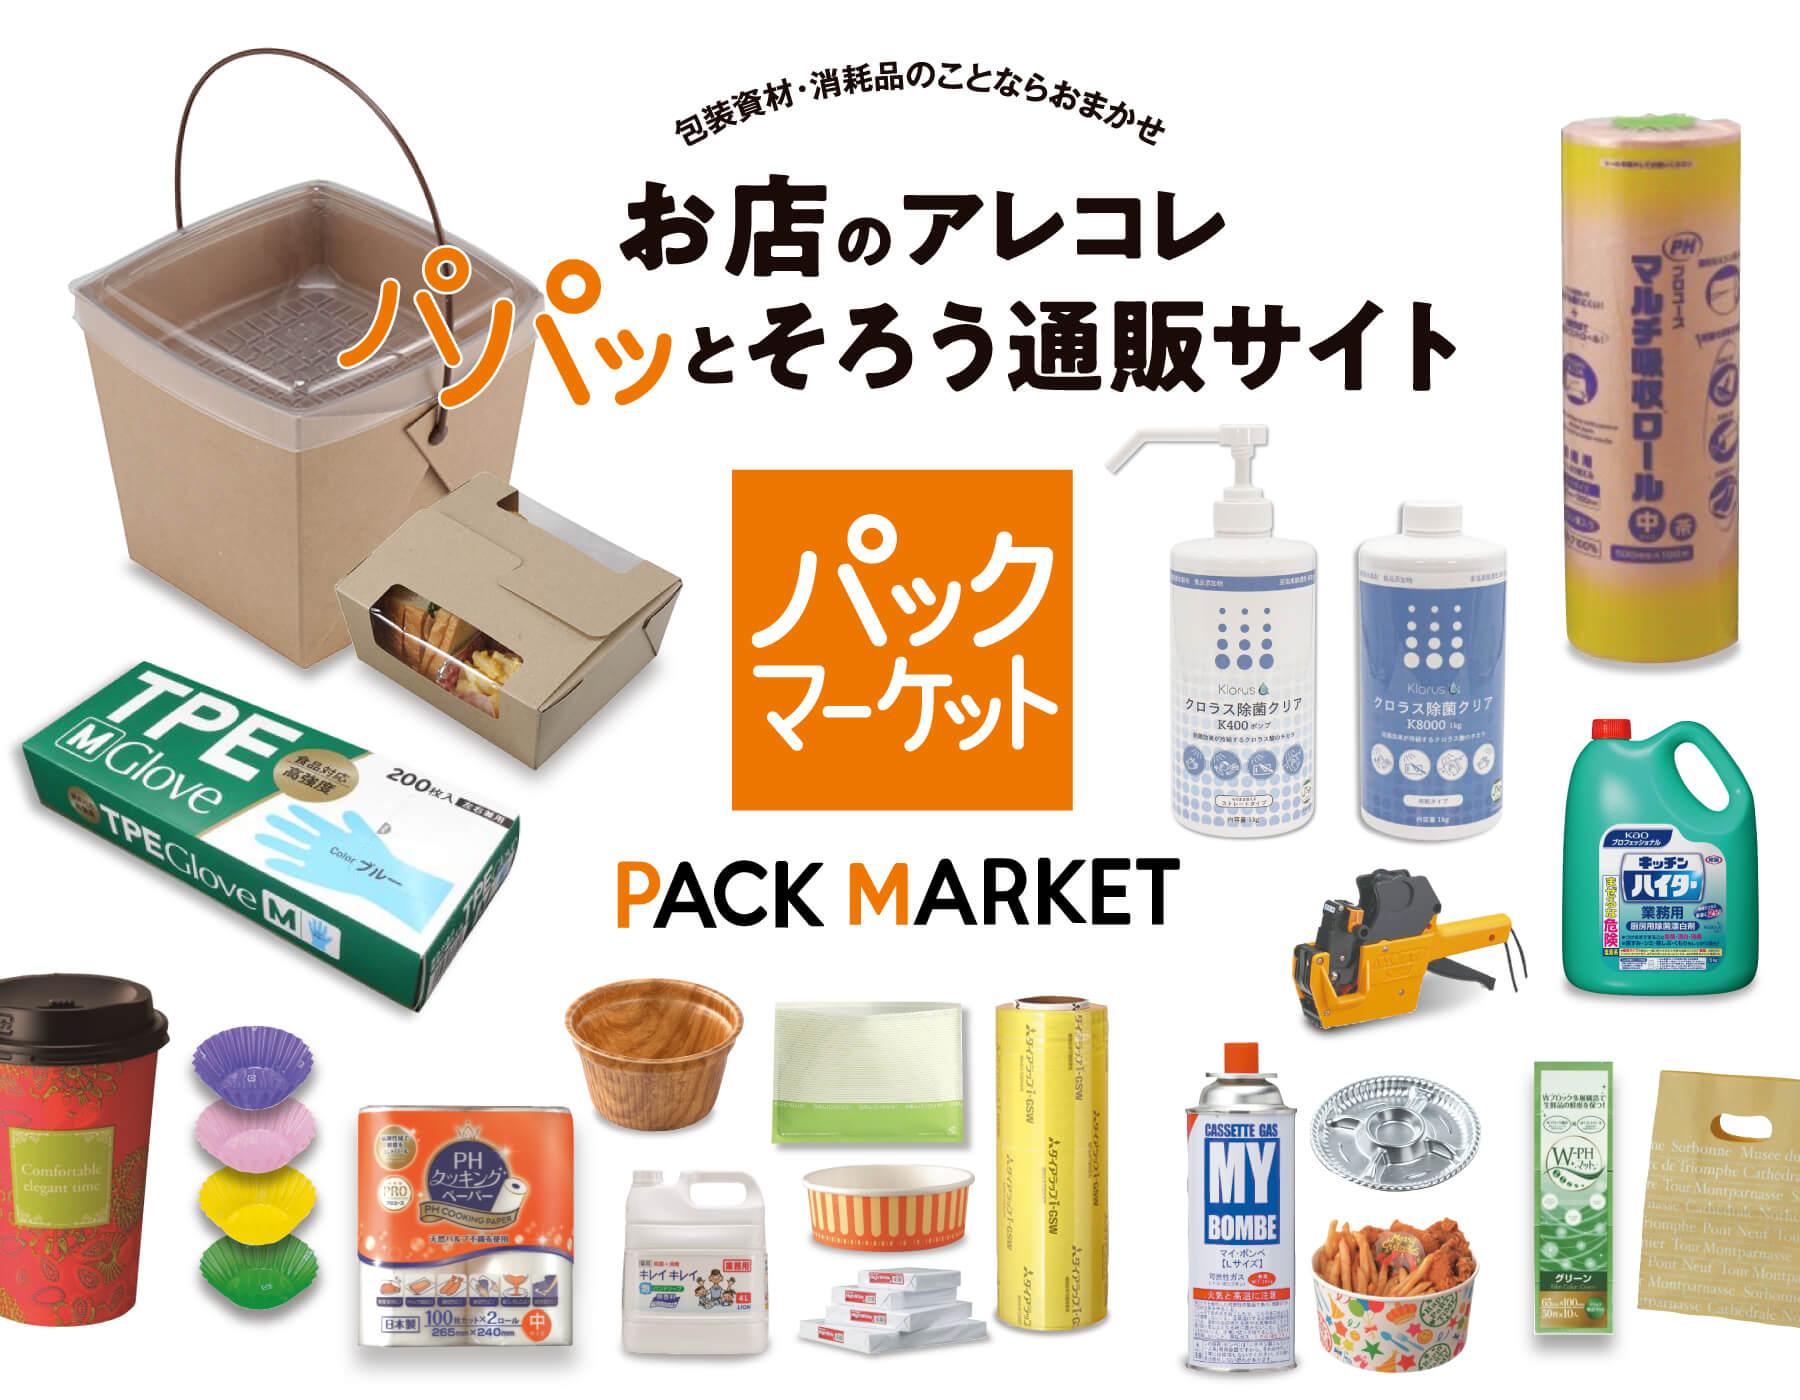 packmarket